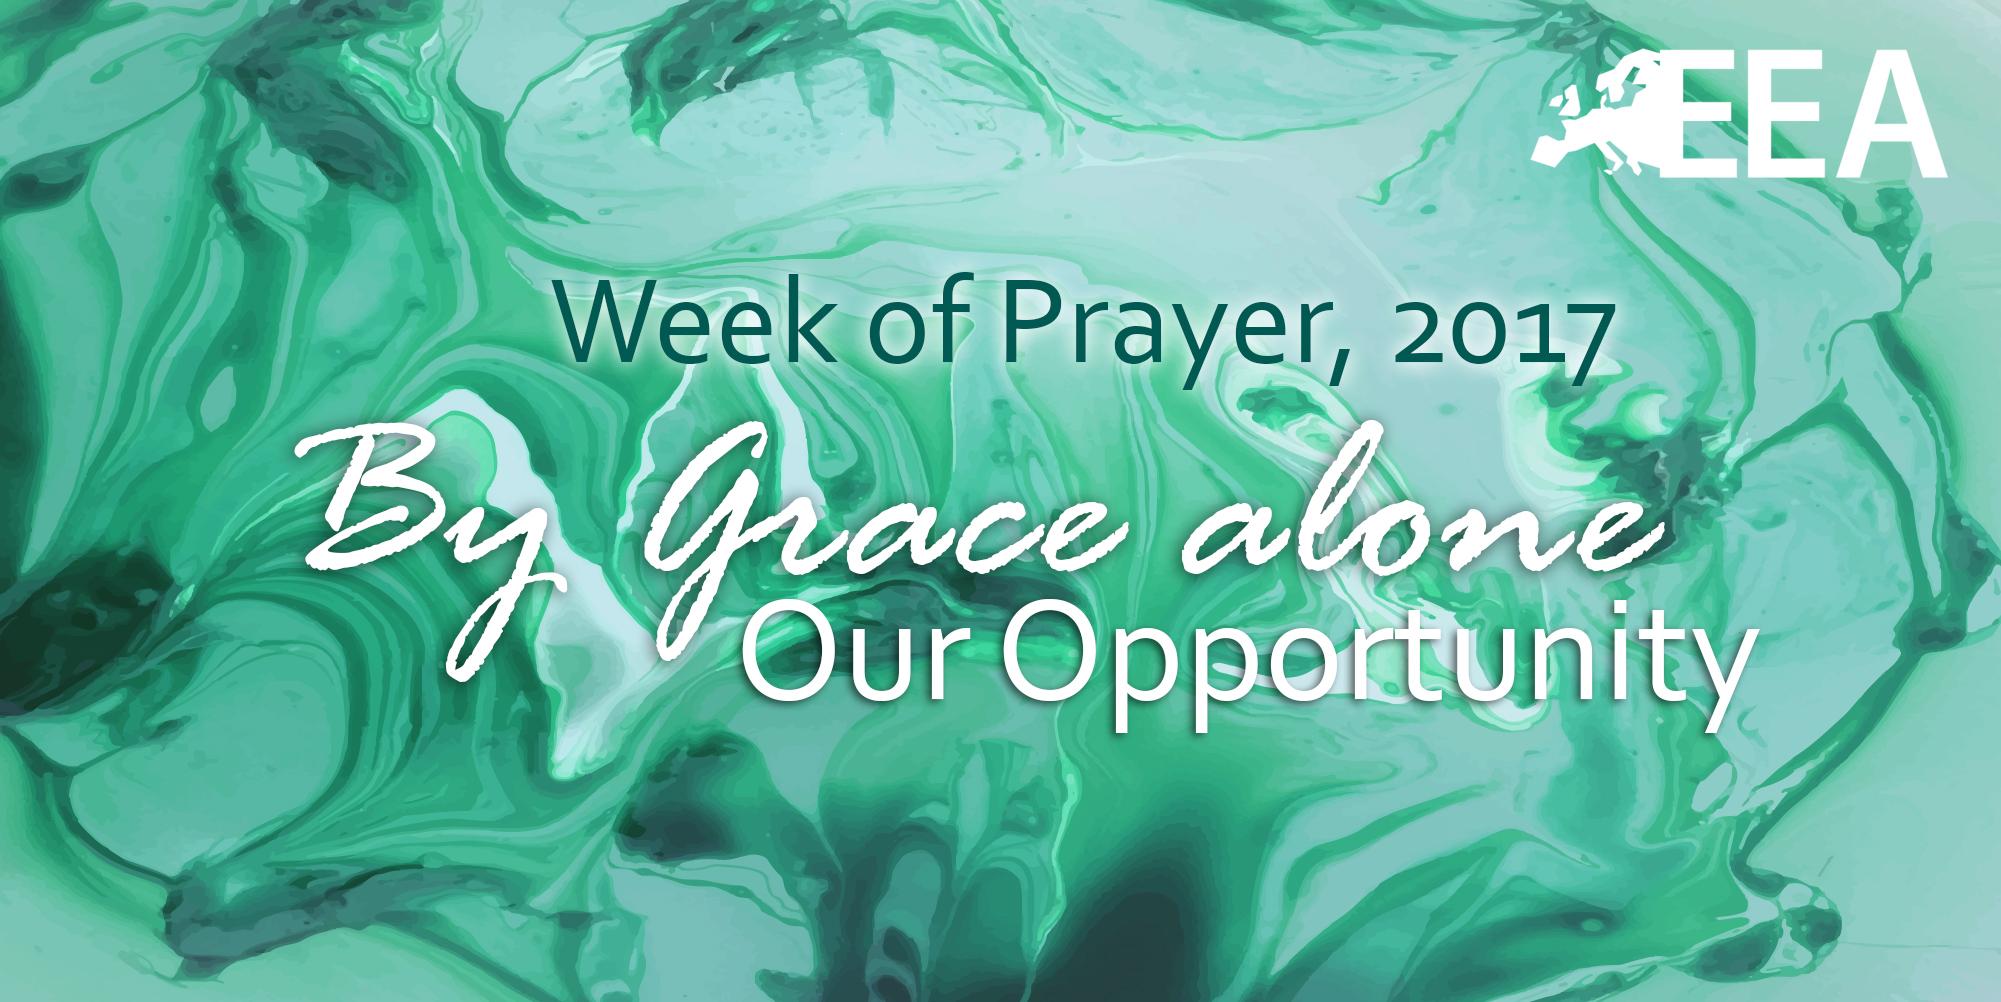 Daily Devotional: Tuesday, 10 January 2017